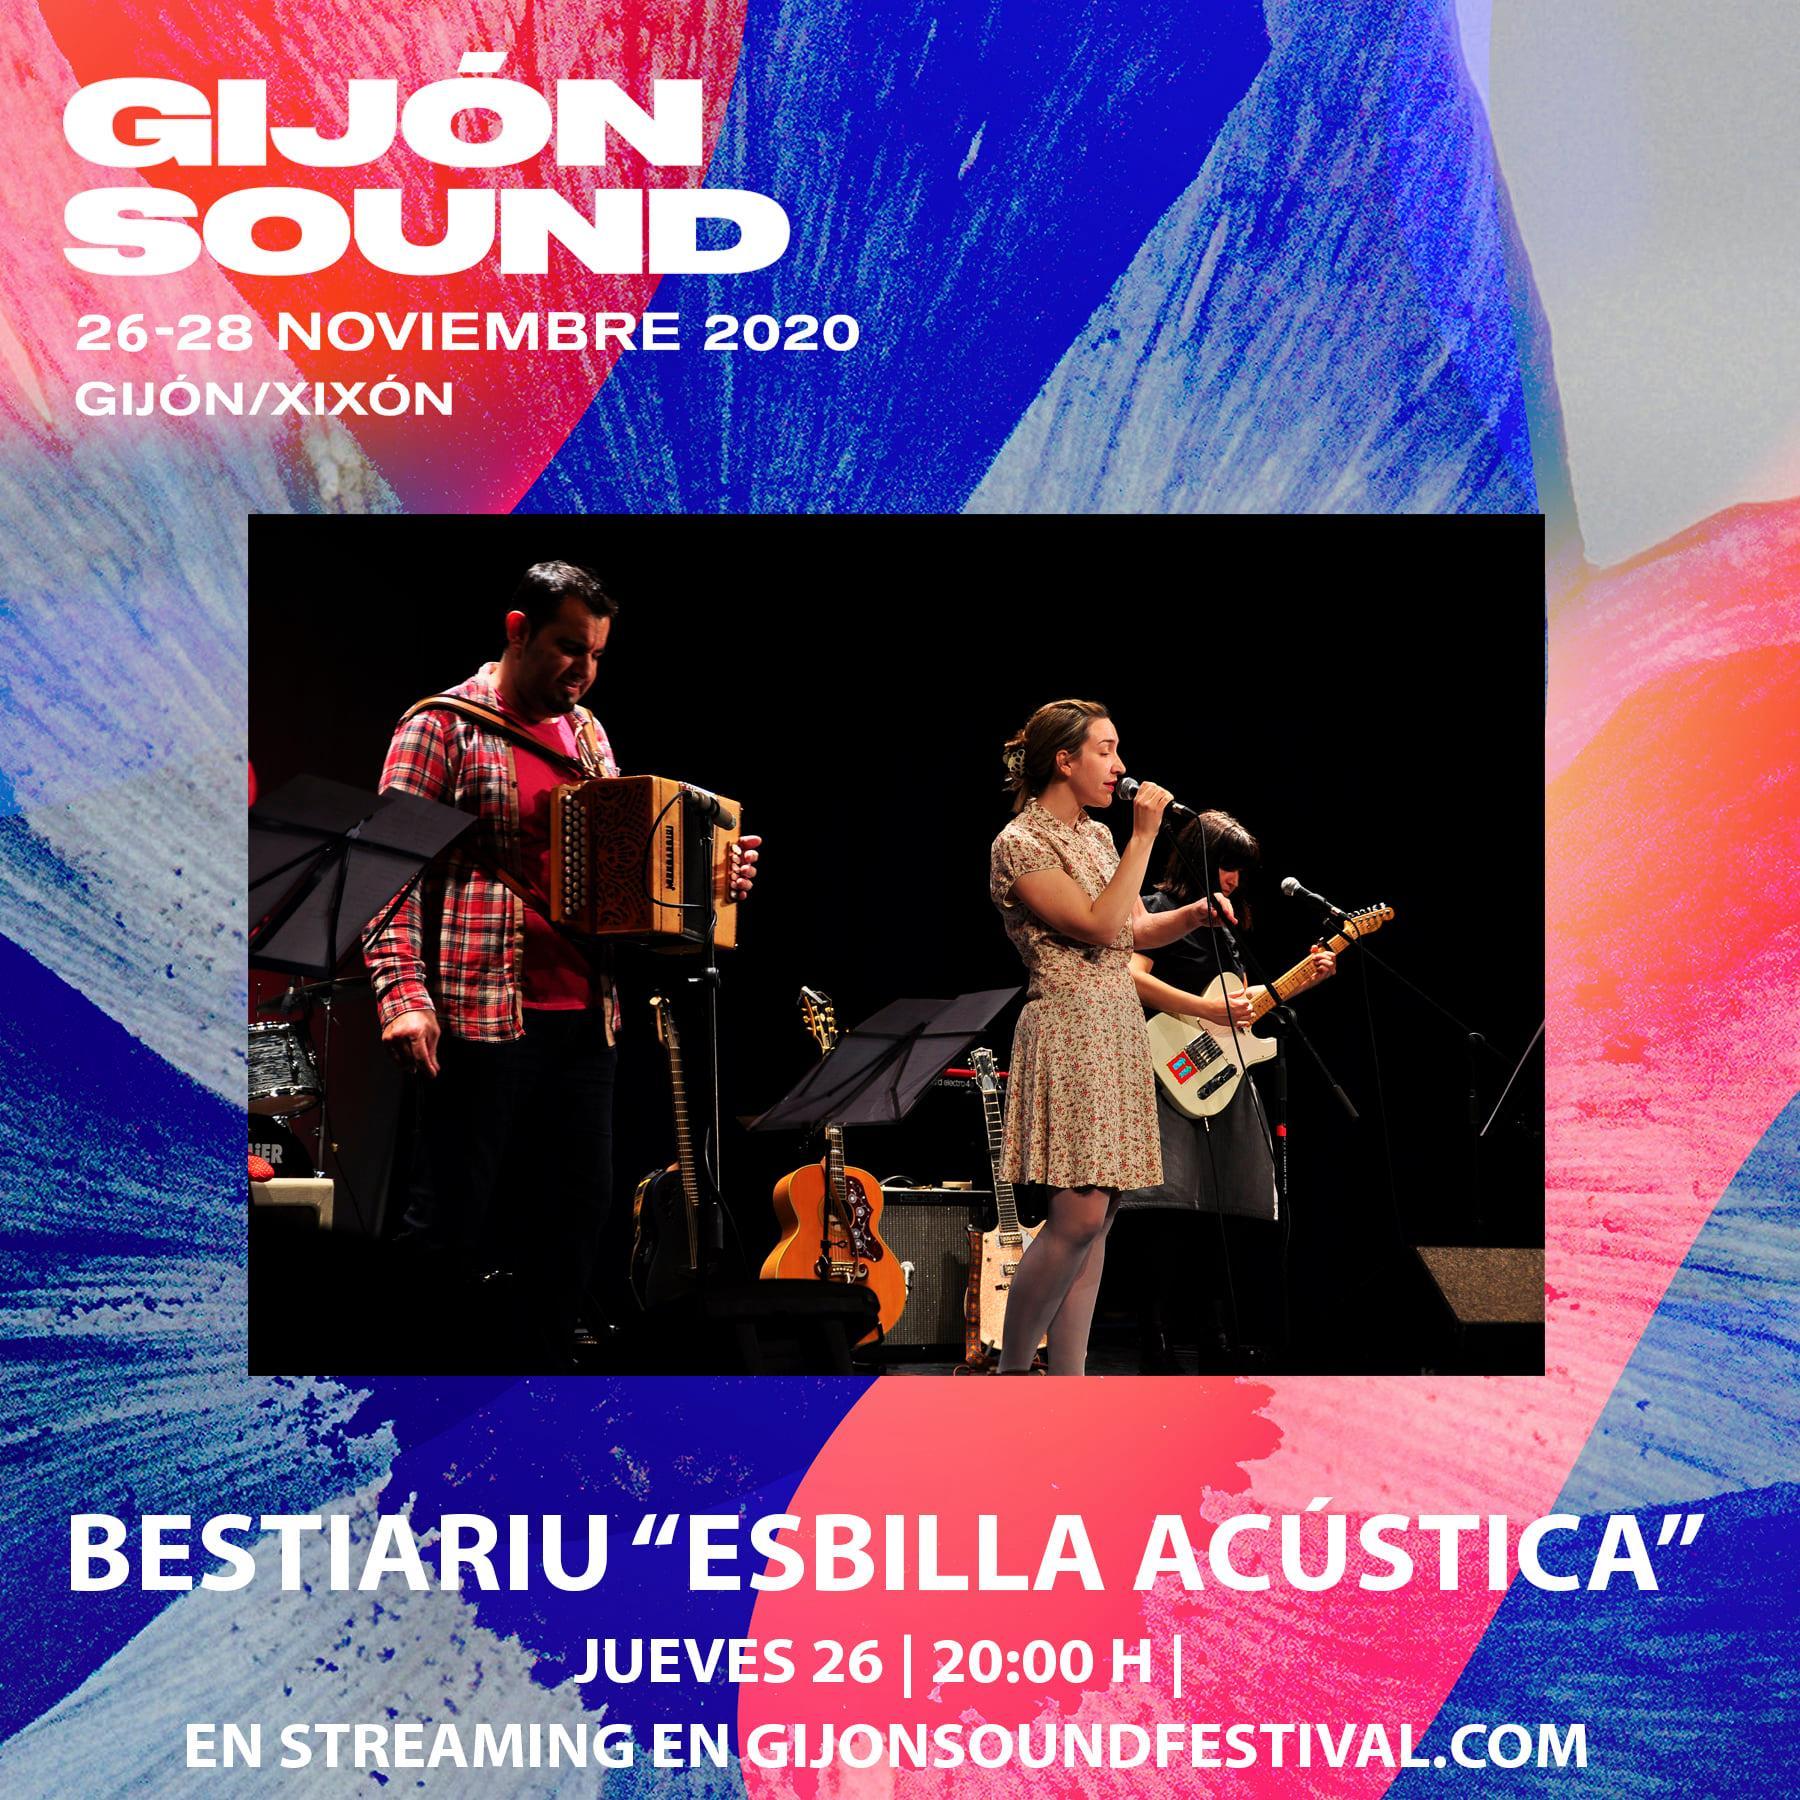 Bestiariu_Gijon_Sound_festival